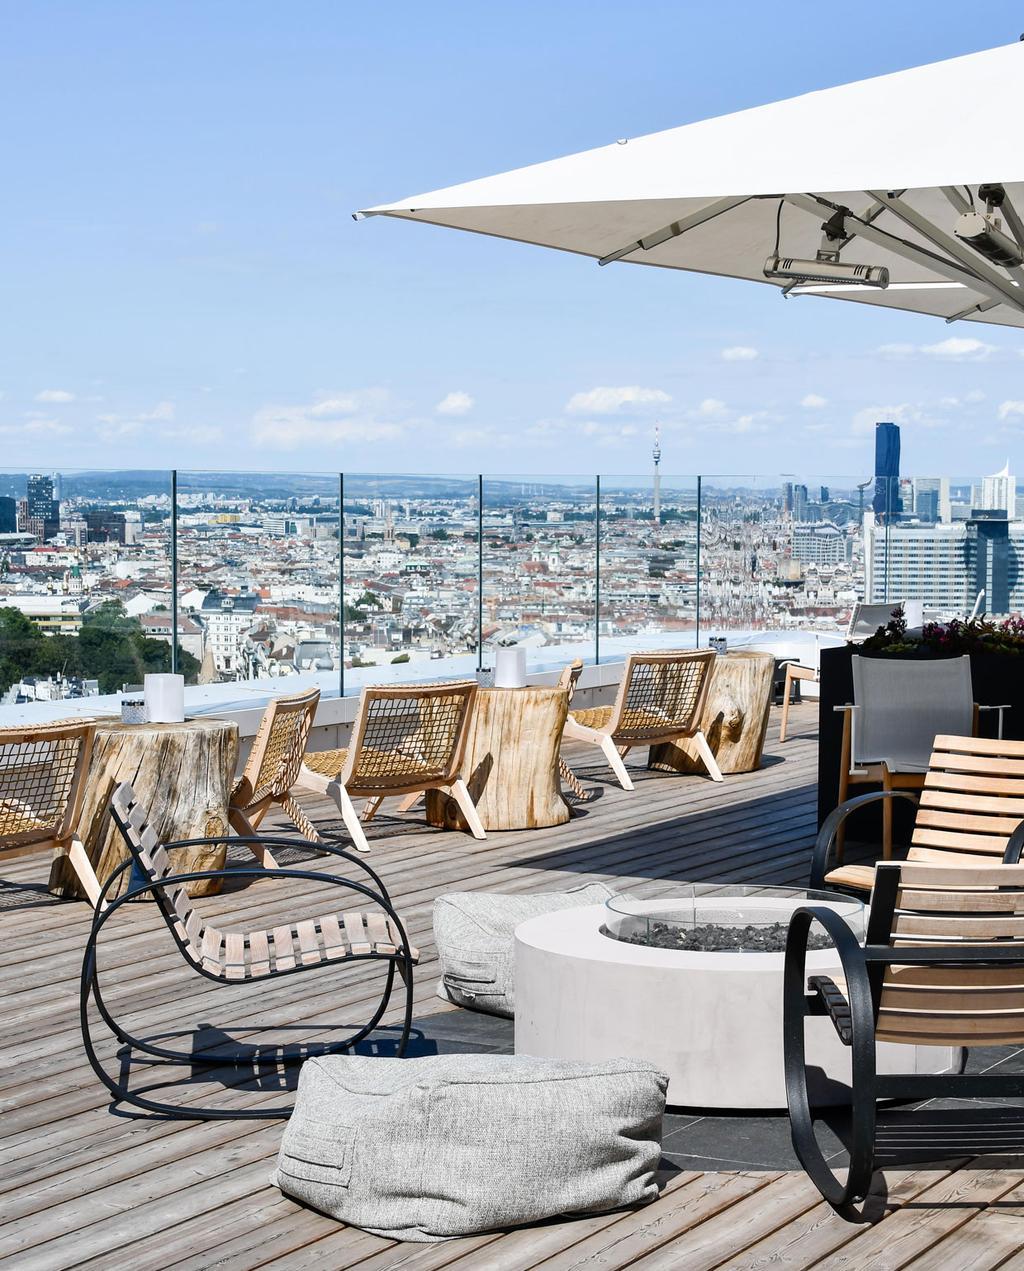 vtwonen 12-2019 | citytrip hotspot wenen voordeel citytrip designhotel